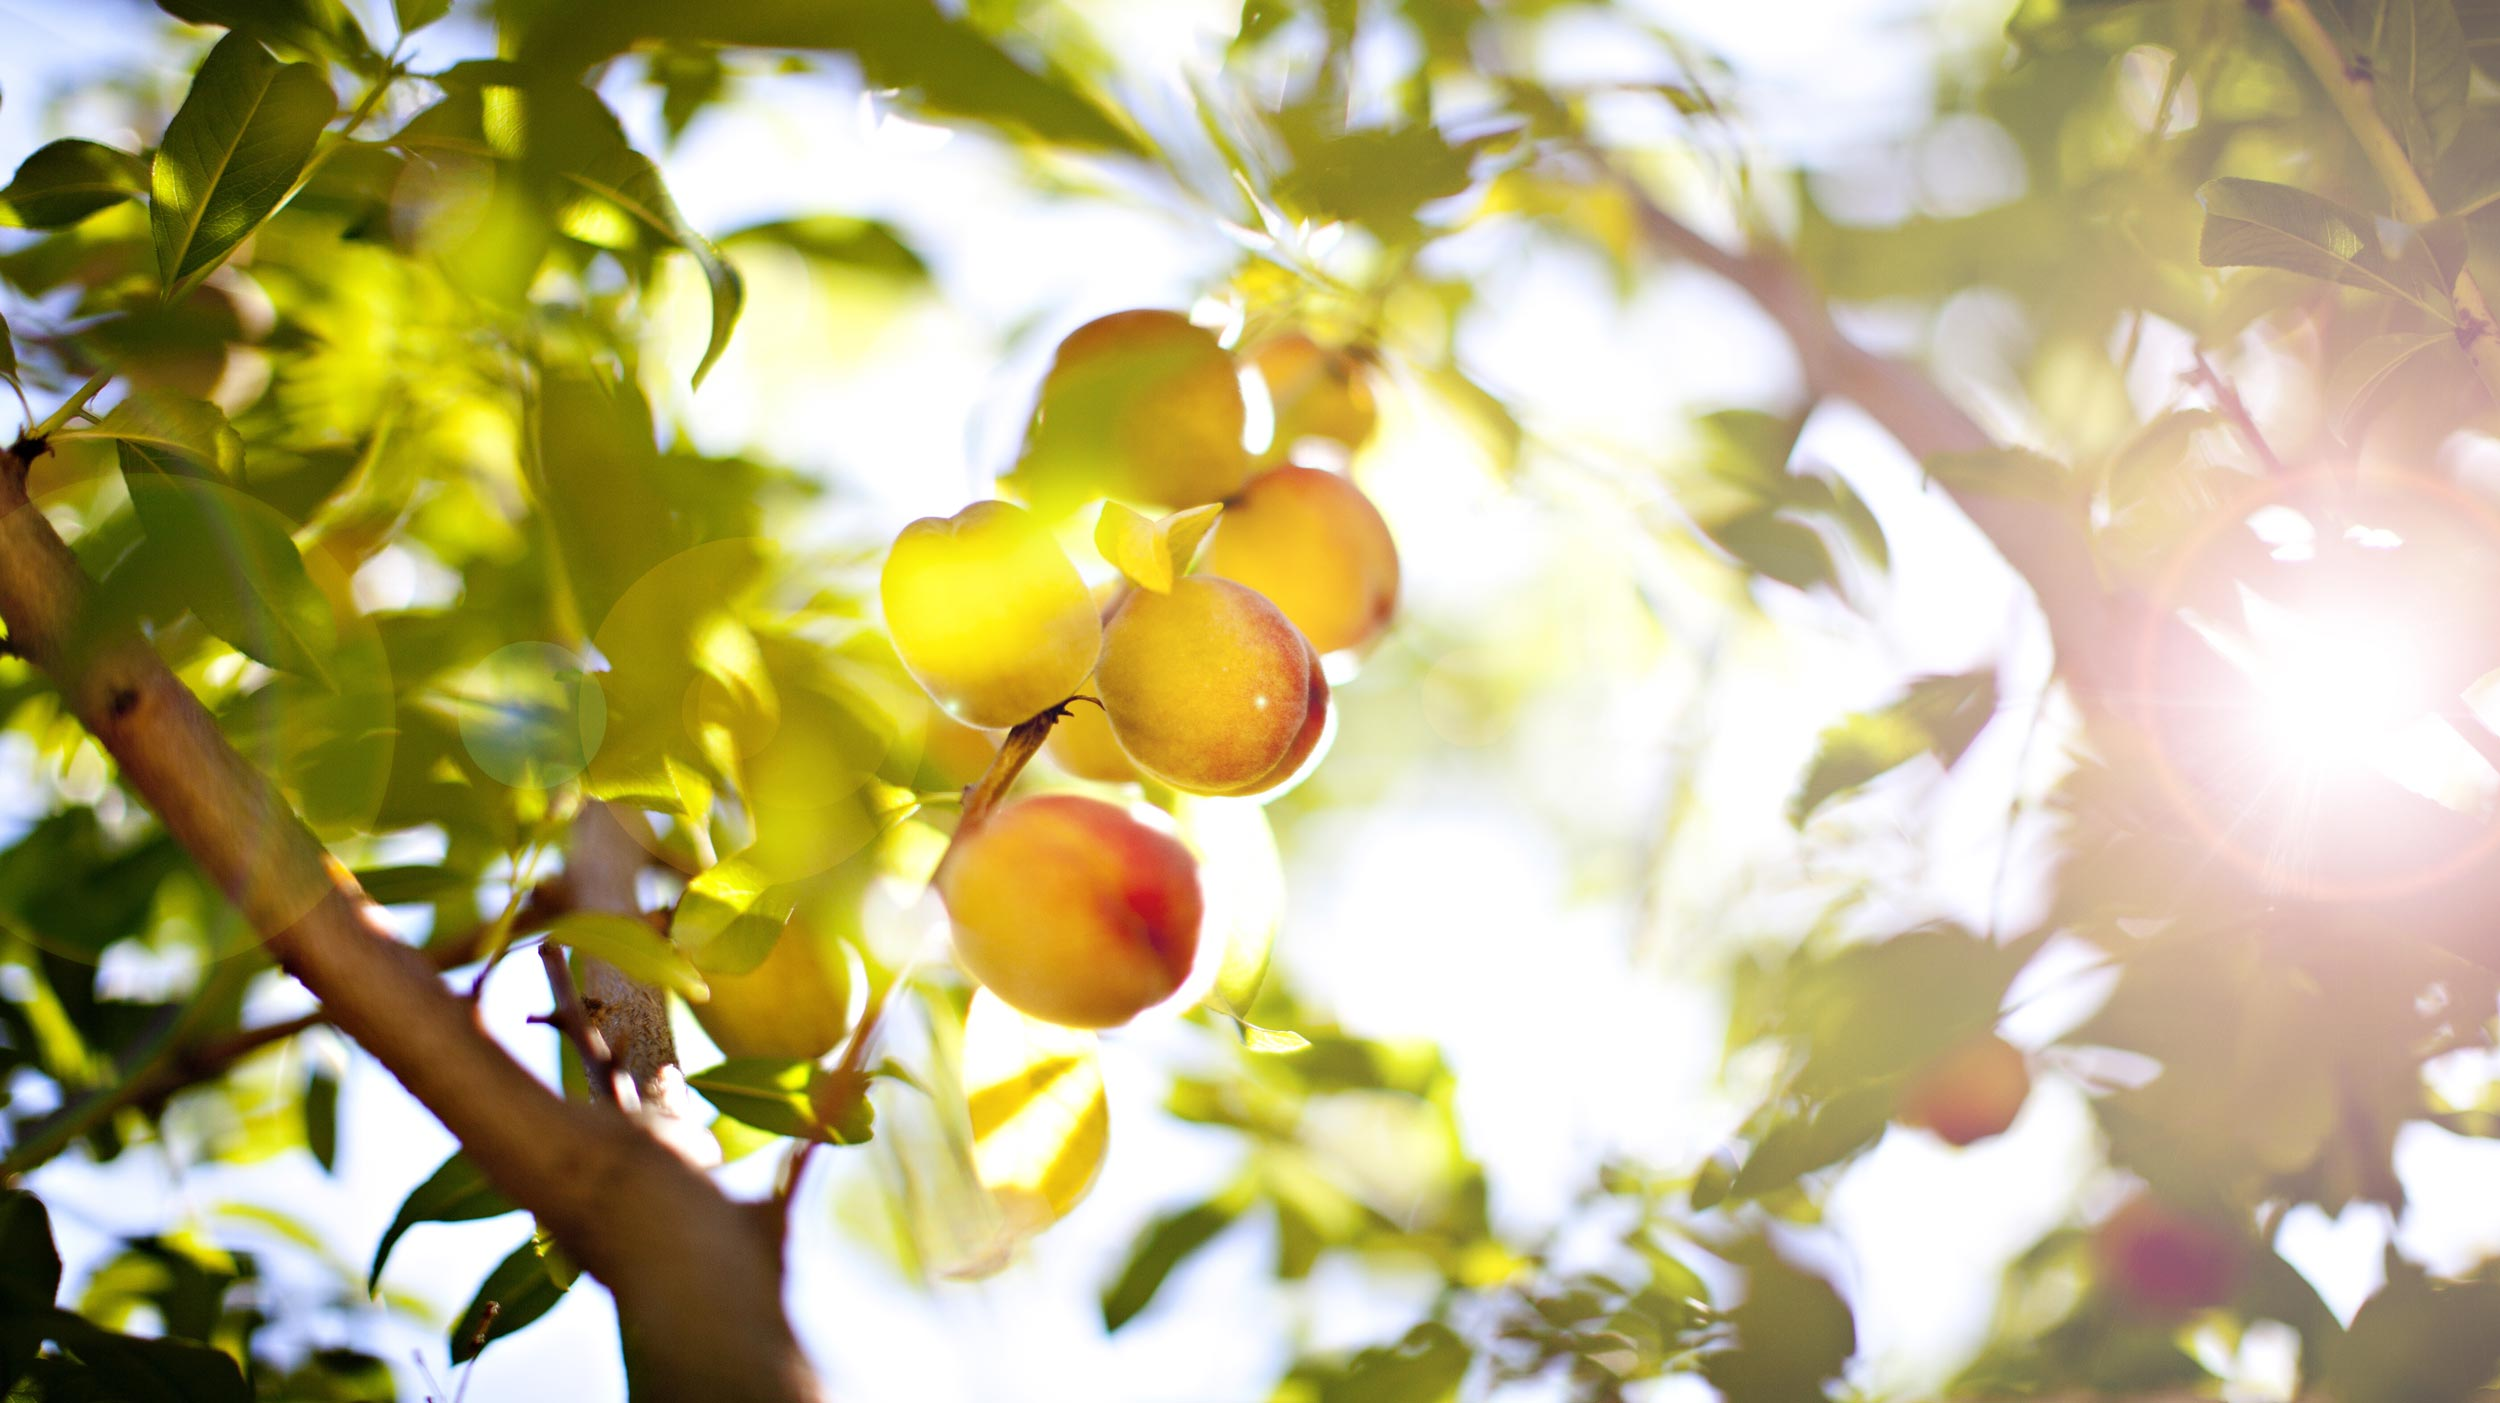 Obstbäume im Frühling richtig düngen